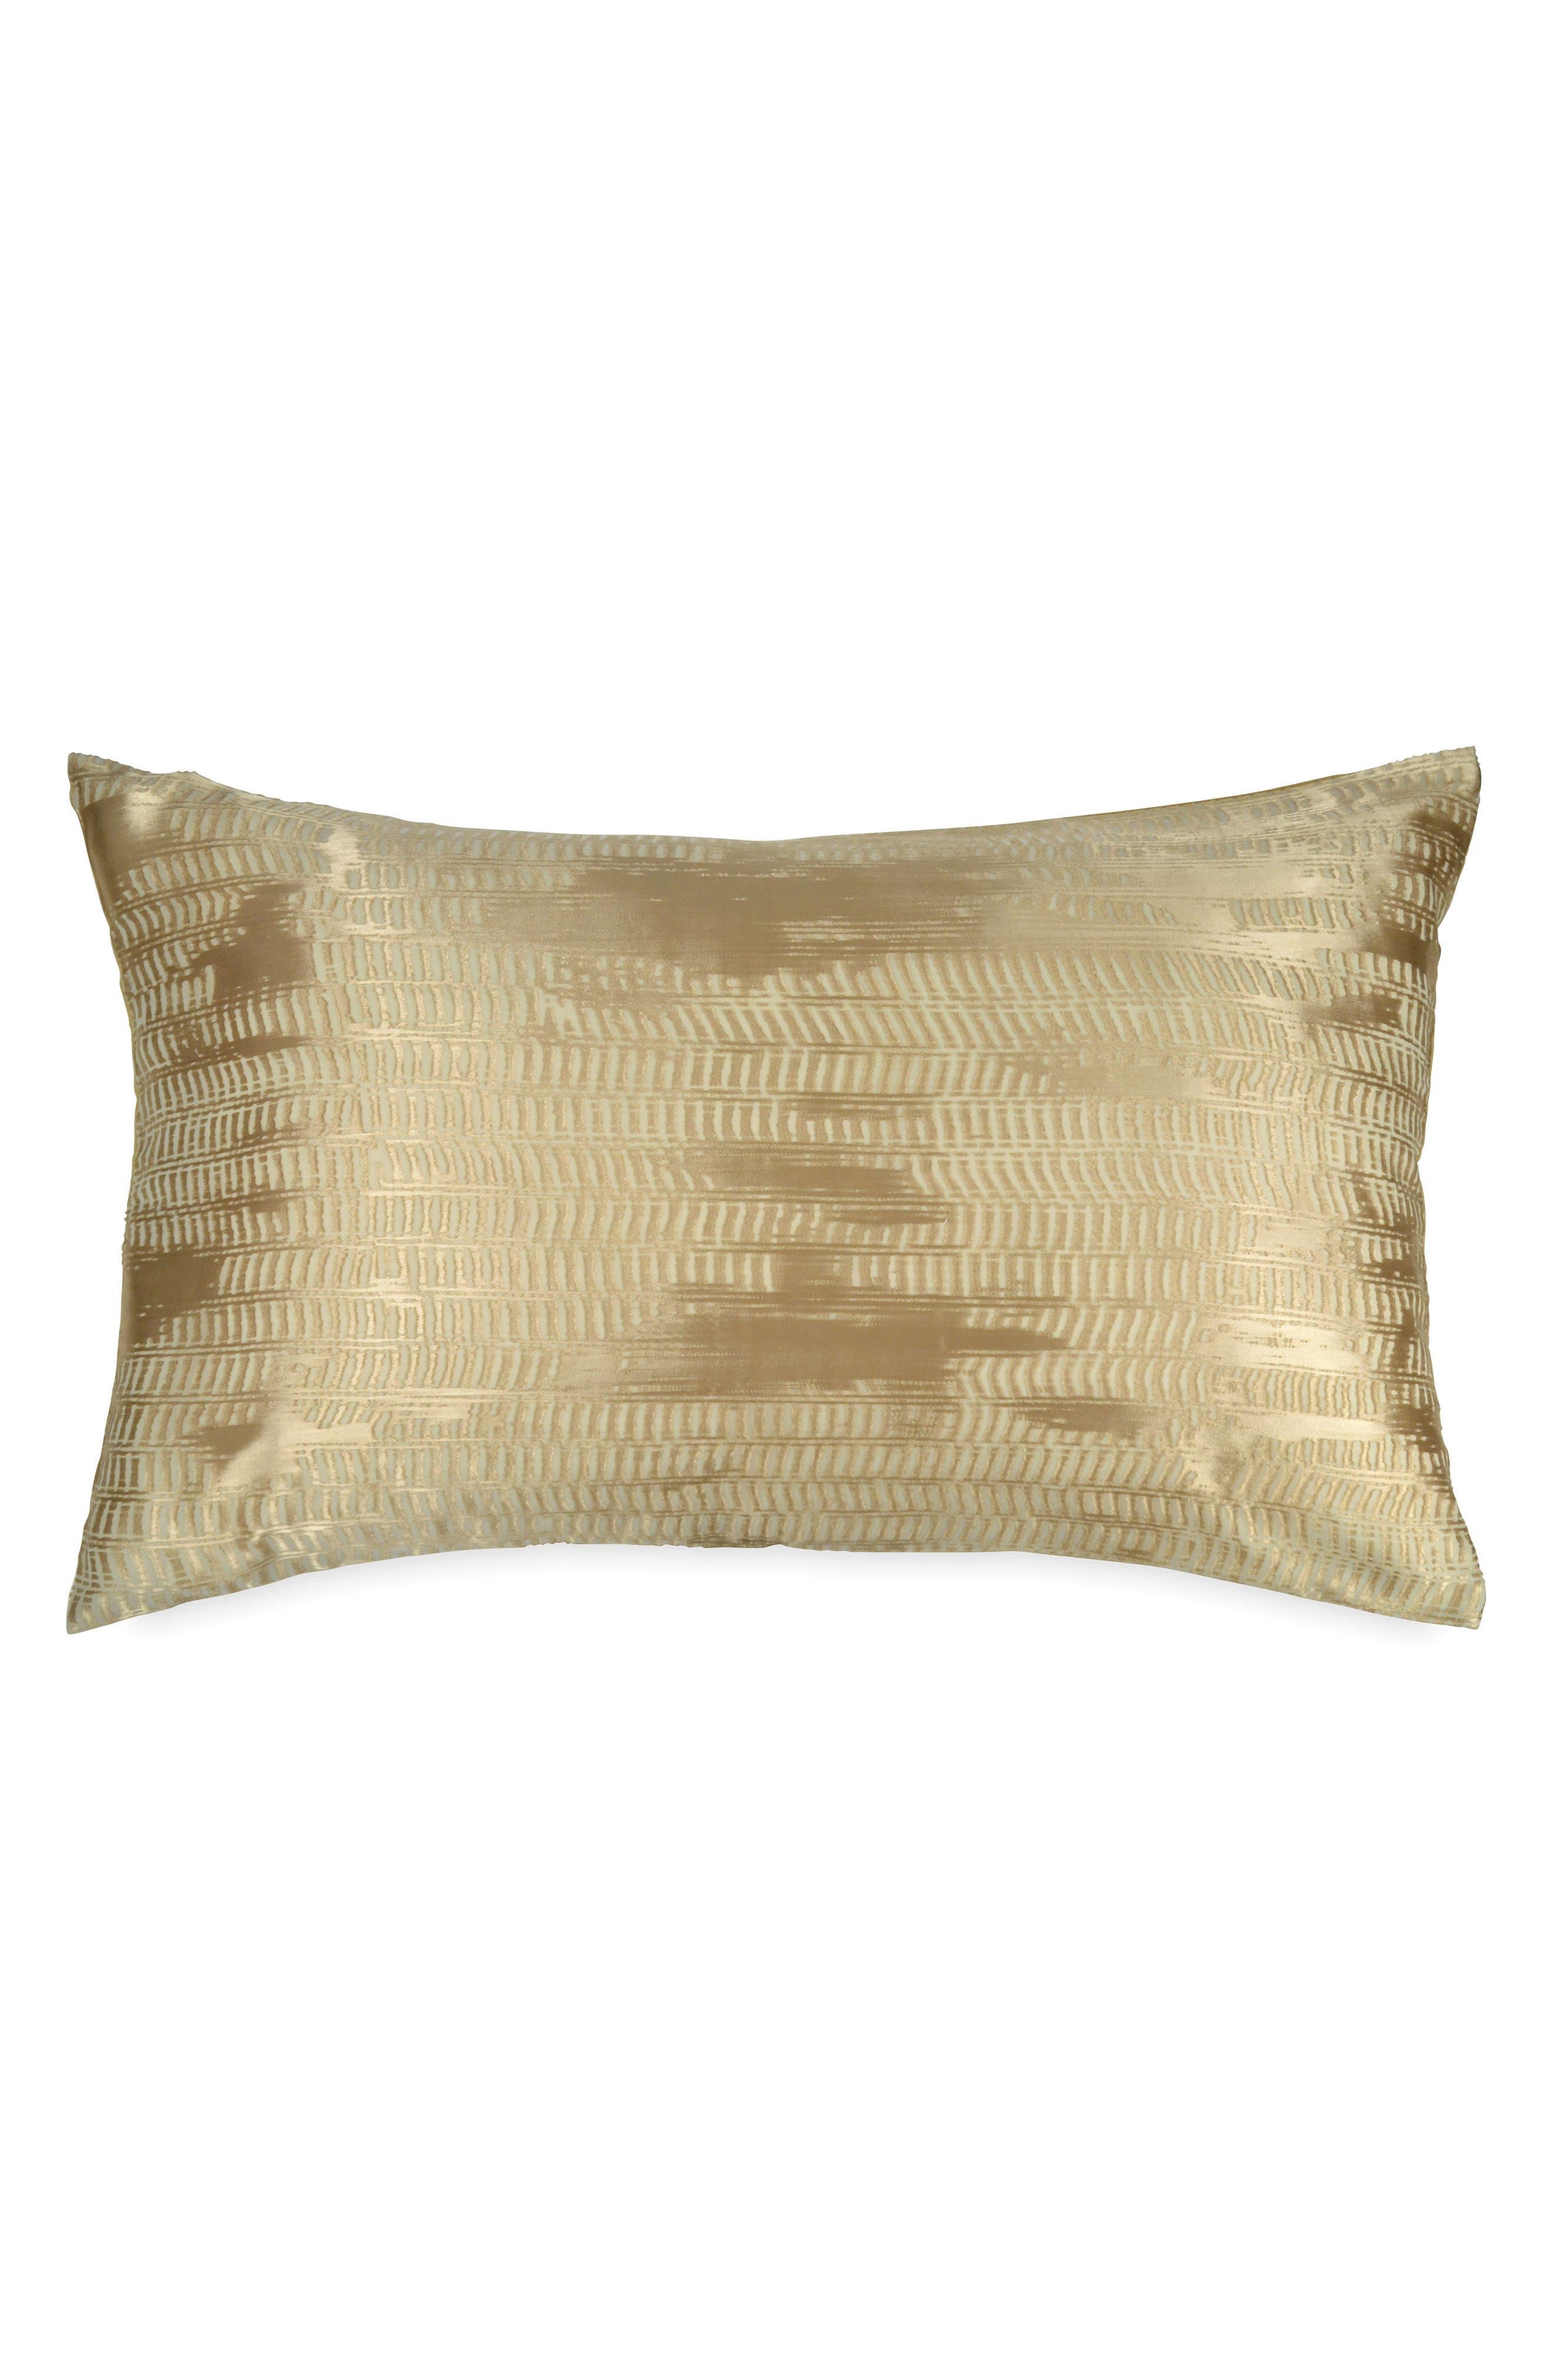 Donna Karan Vapor Sham,                         Main,                         color, GOLD DUST